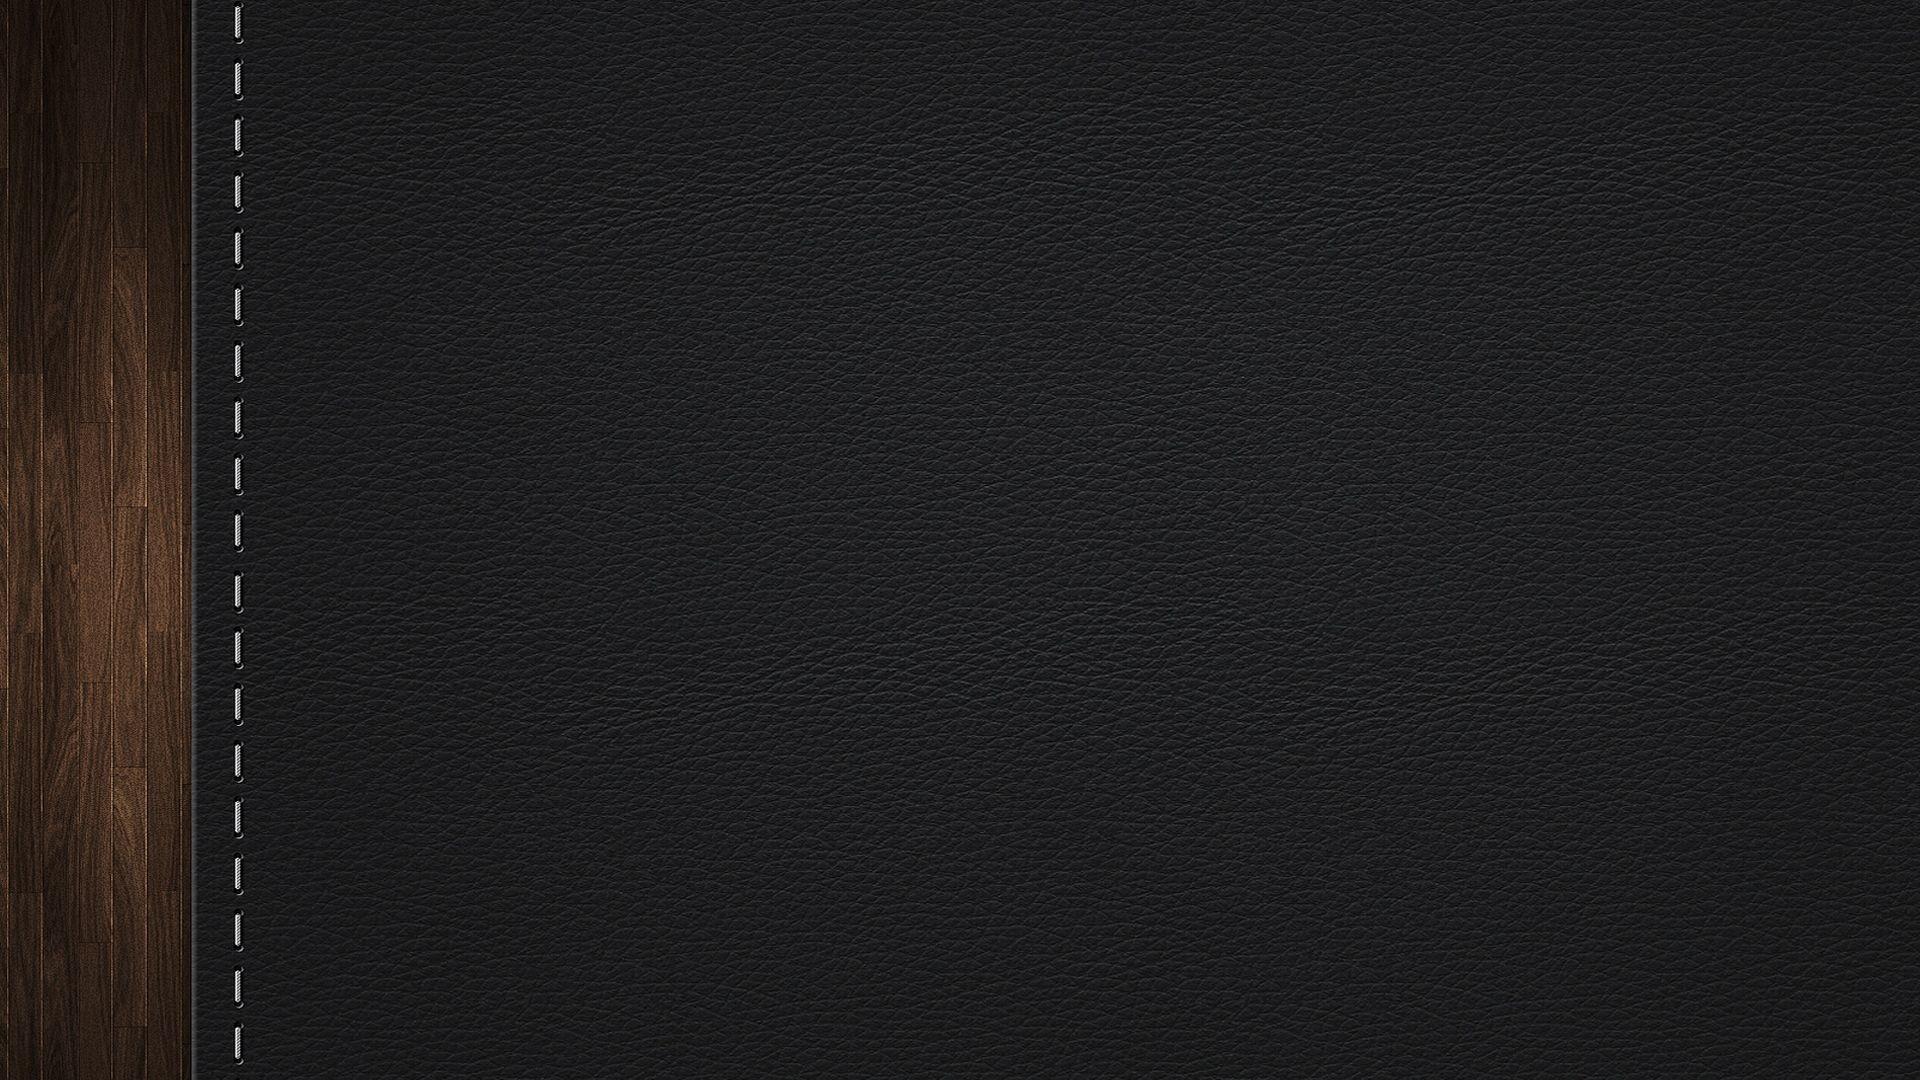 2880x1800 Shades Of Blue Texture Wallpaper